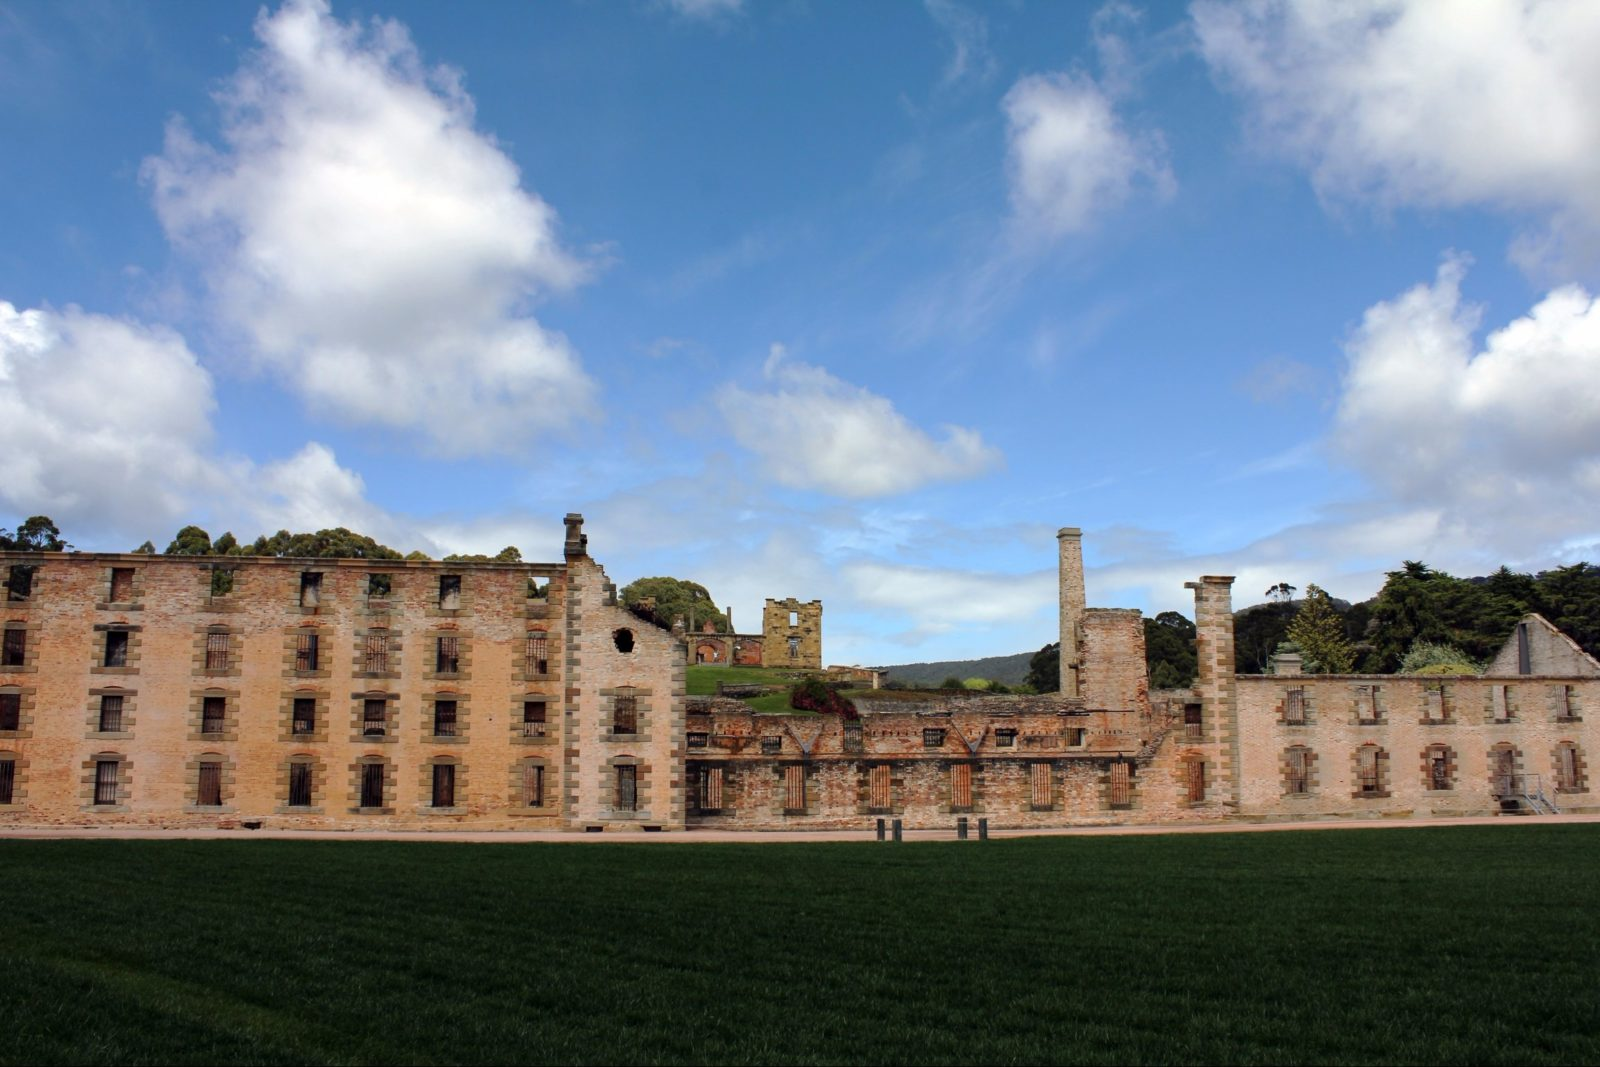 Convict buildings